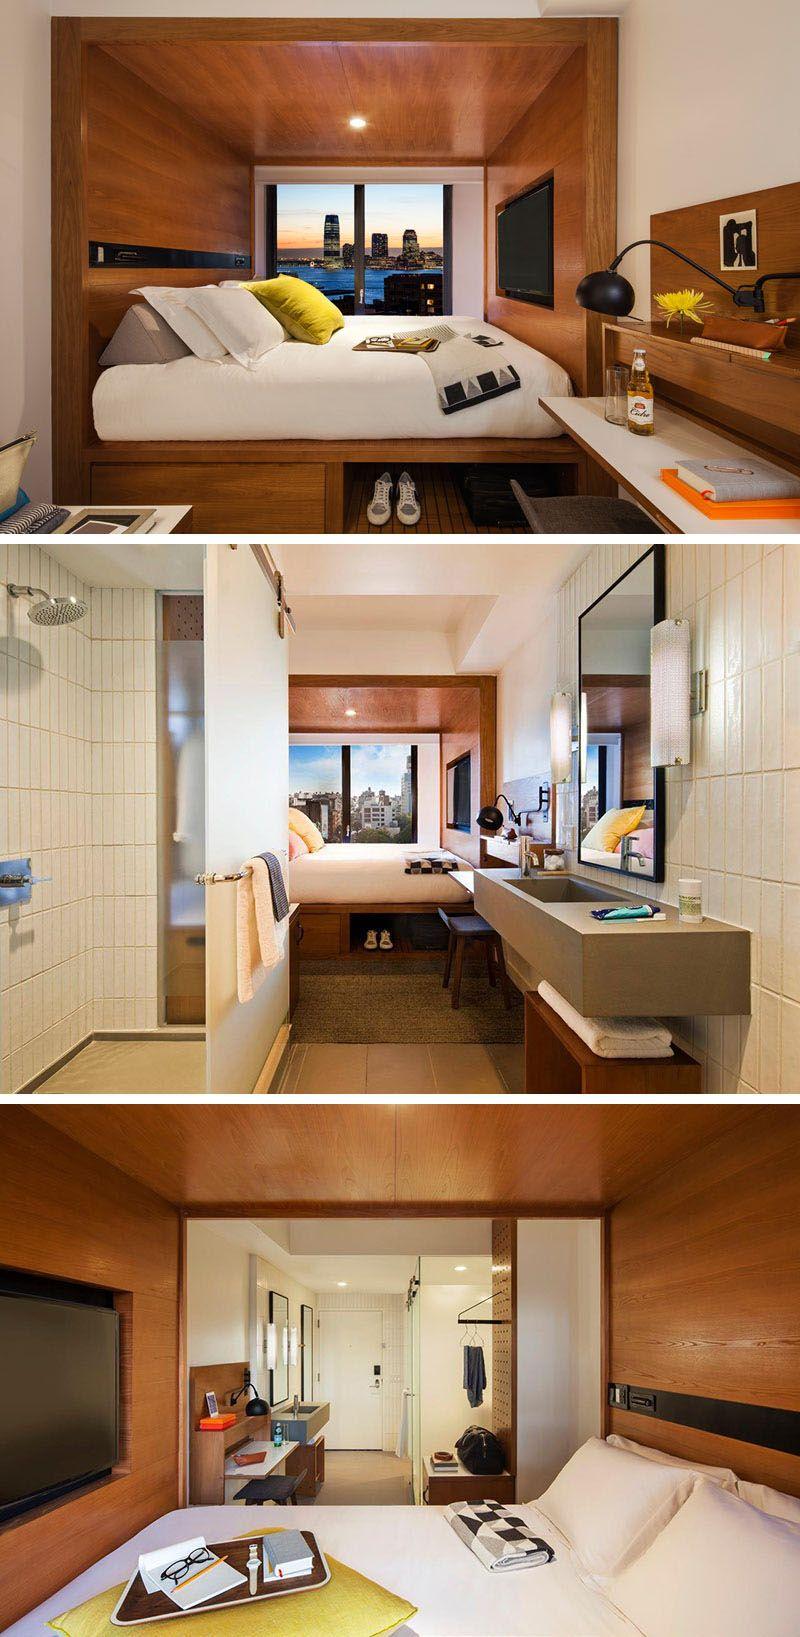 8 Small Hotel Rooms Maximize Tiny Space